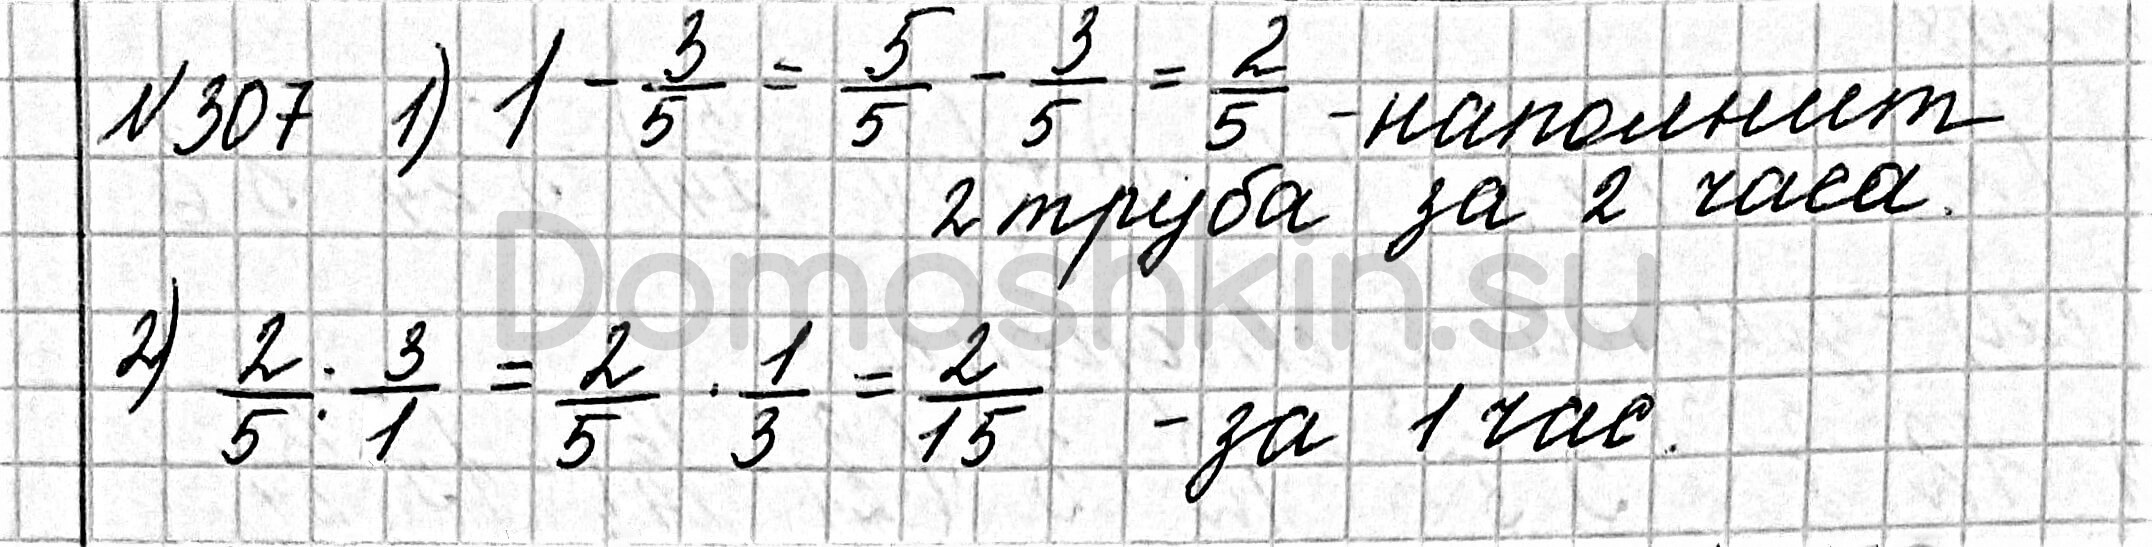 Математика 6 класс учебник Мерзляк номер 307 решение